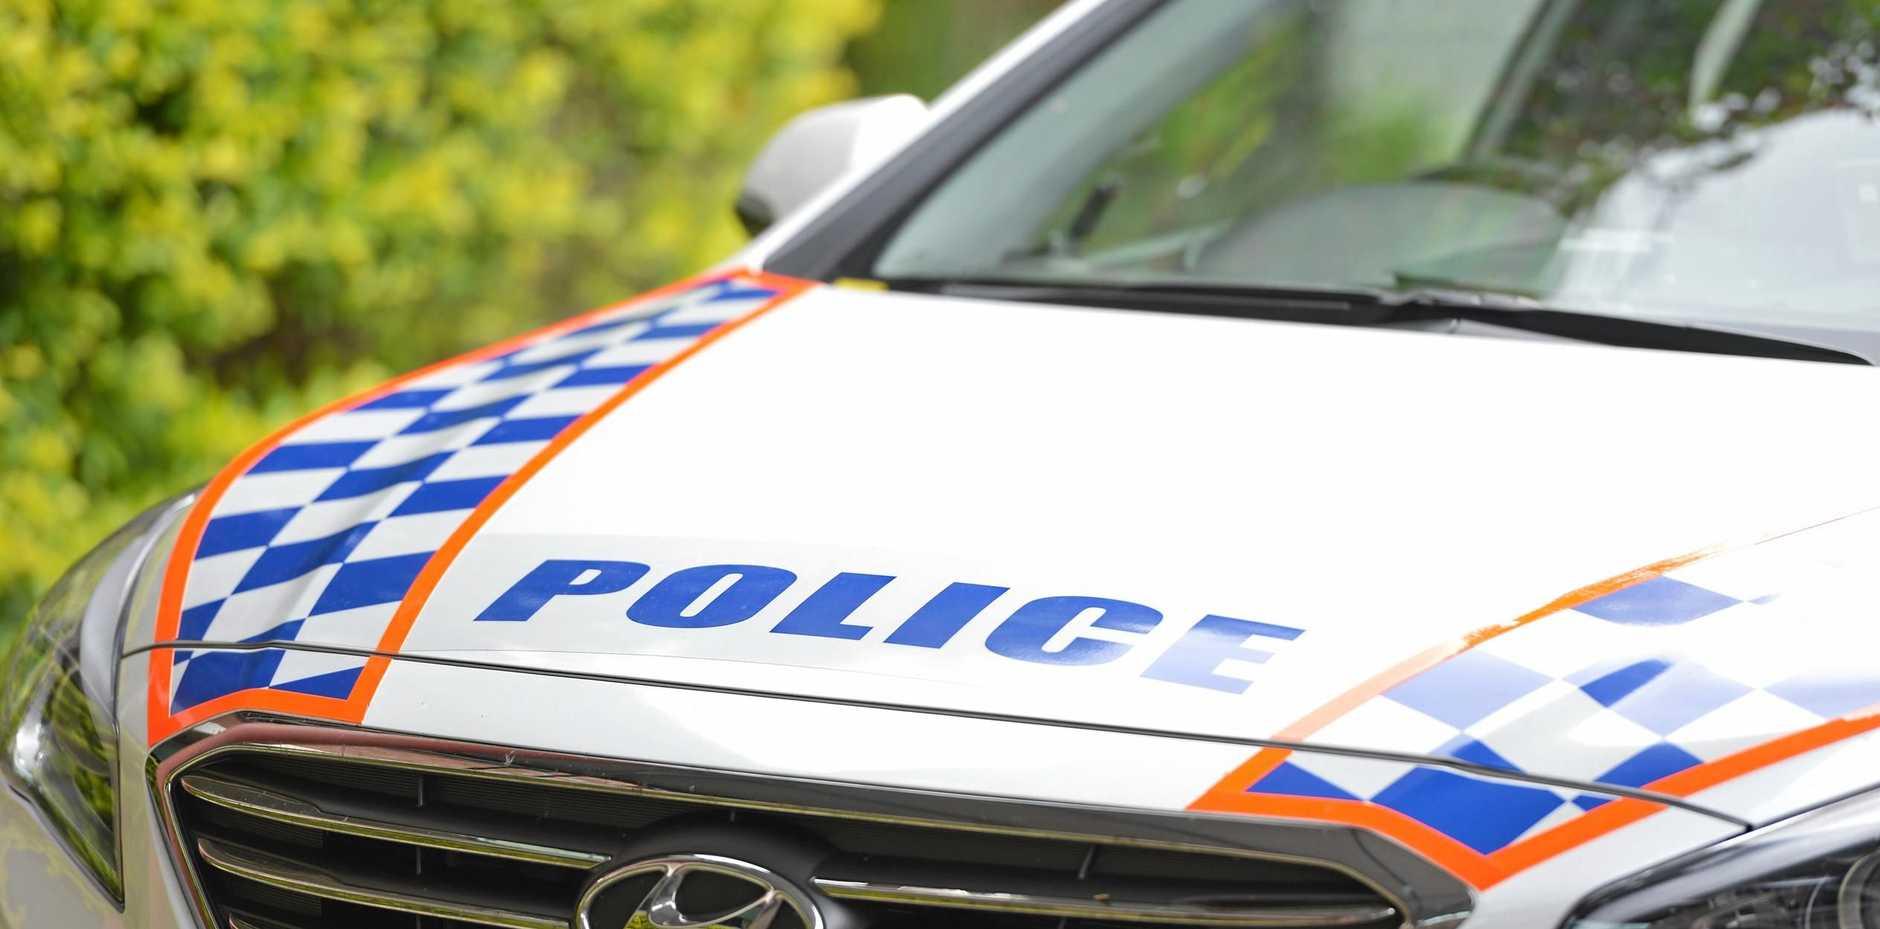 STOLEN CARS: One vehicle was taken on Australia Day.